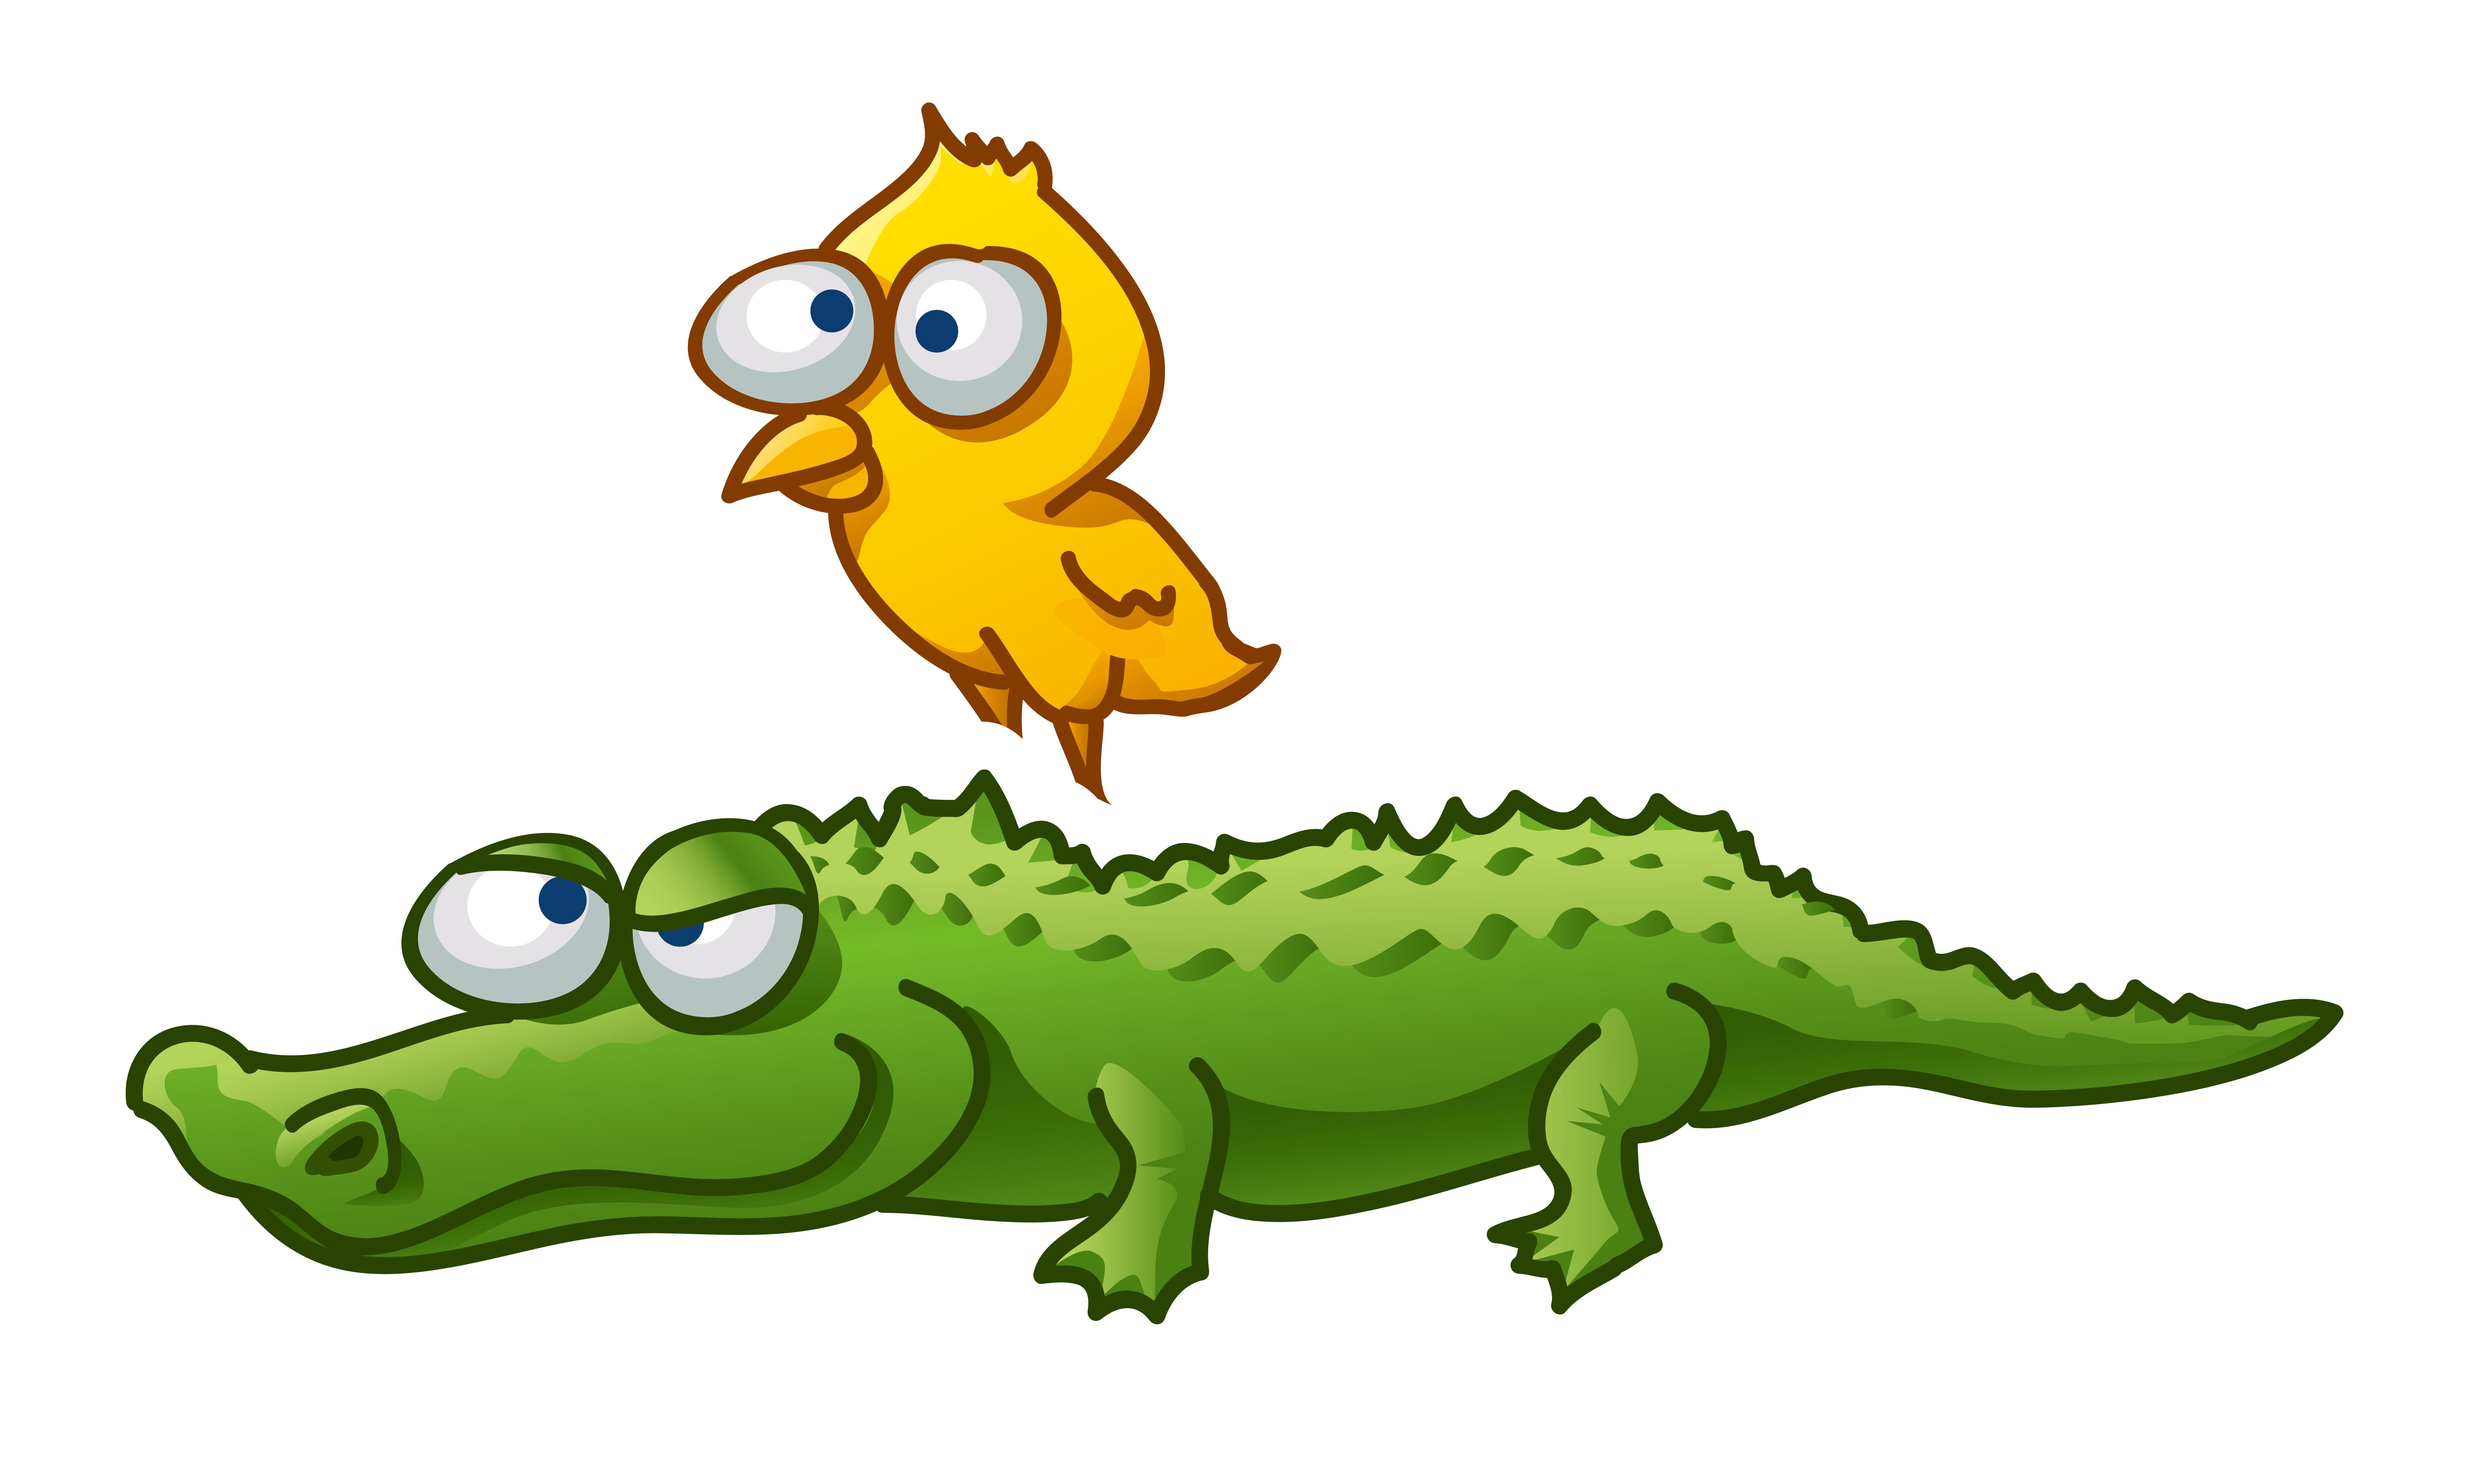 Nile crocodile at getdrawings. Clipart eye alligator